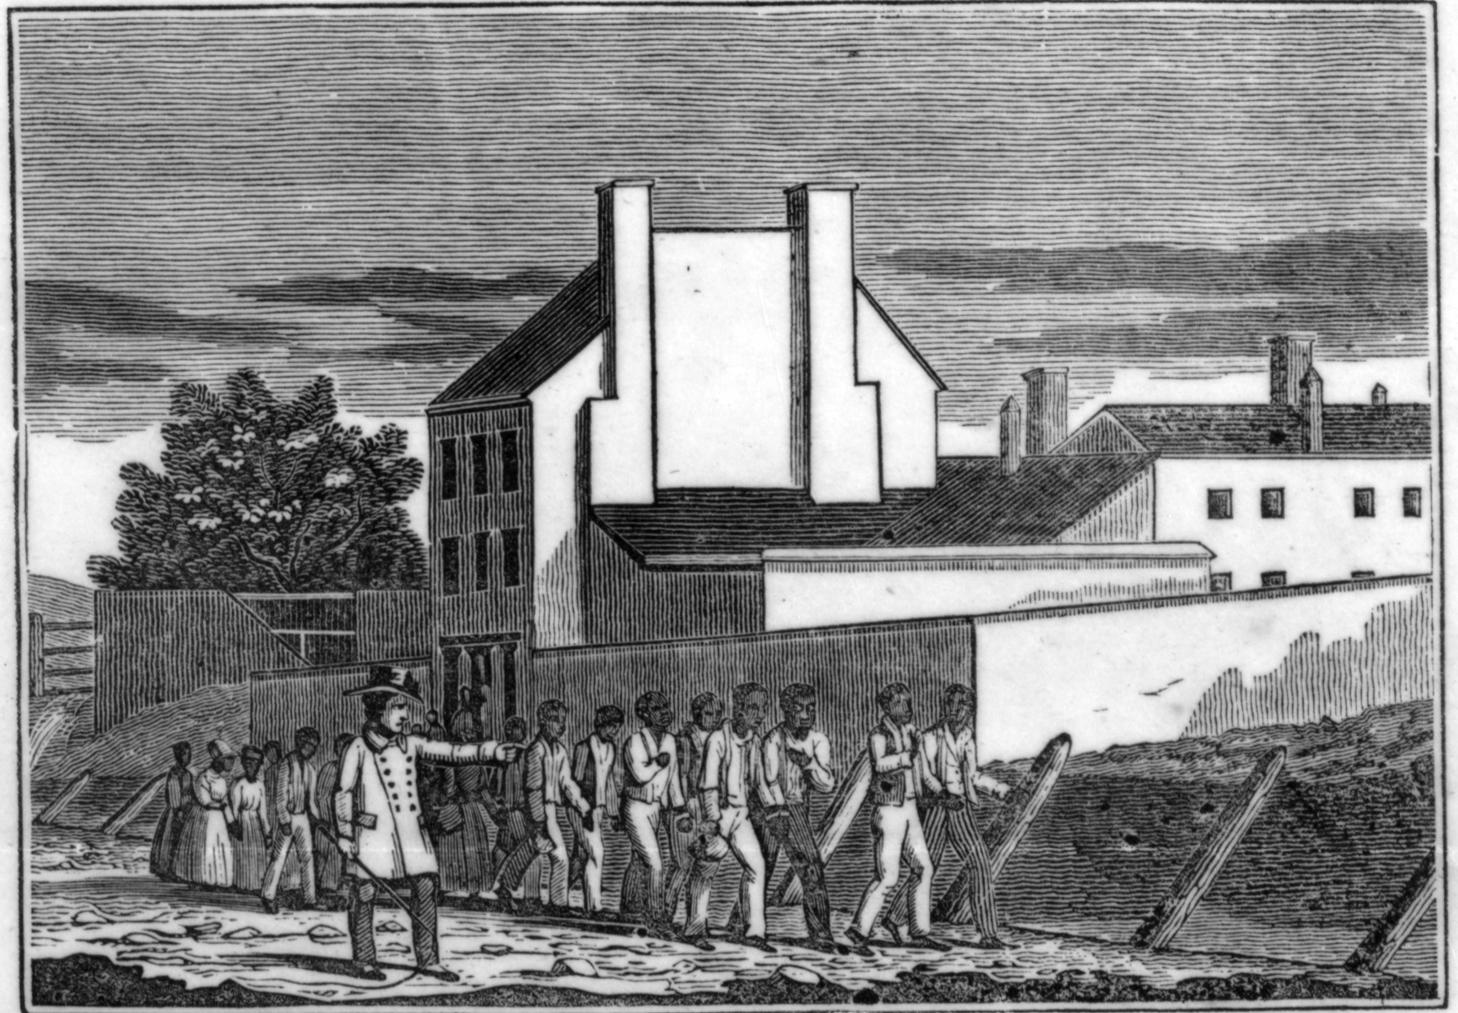 franklin_and_armfield_slave_prison_alexandria_virginia_1836